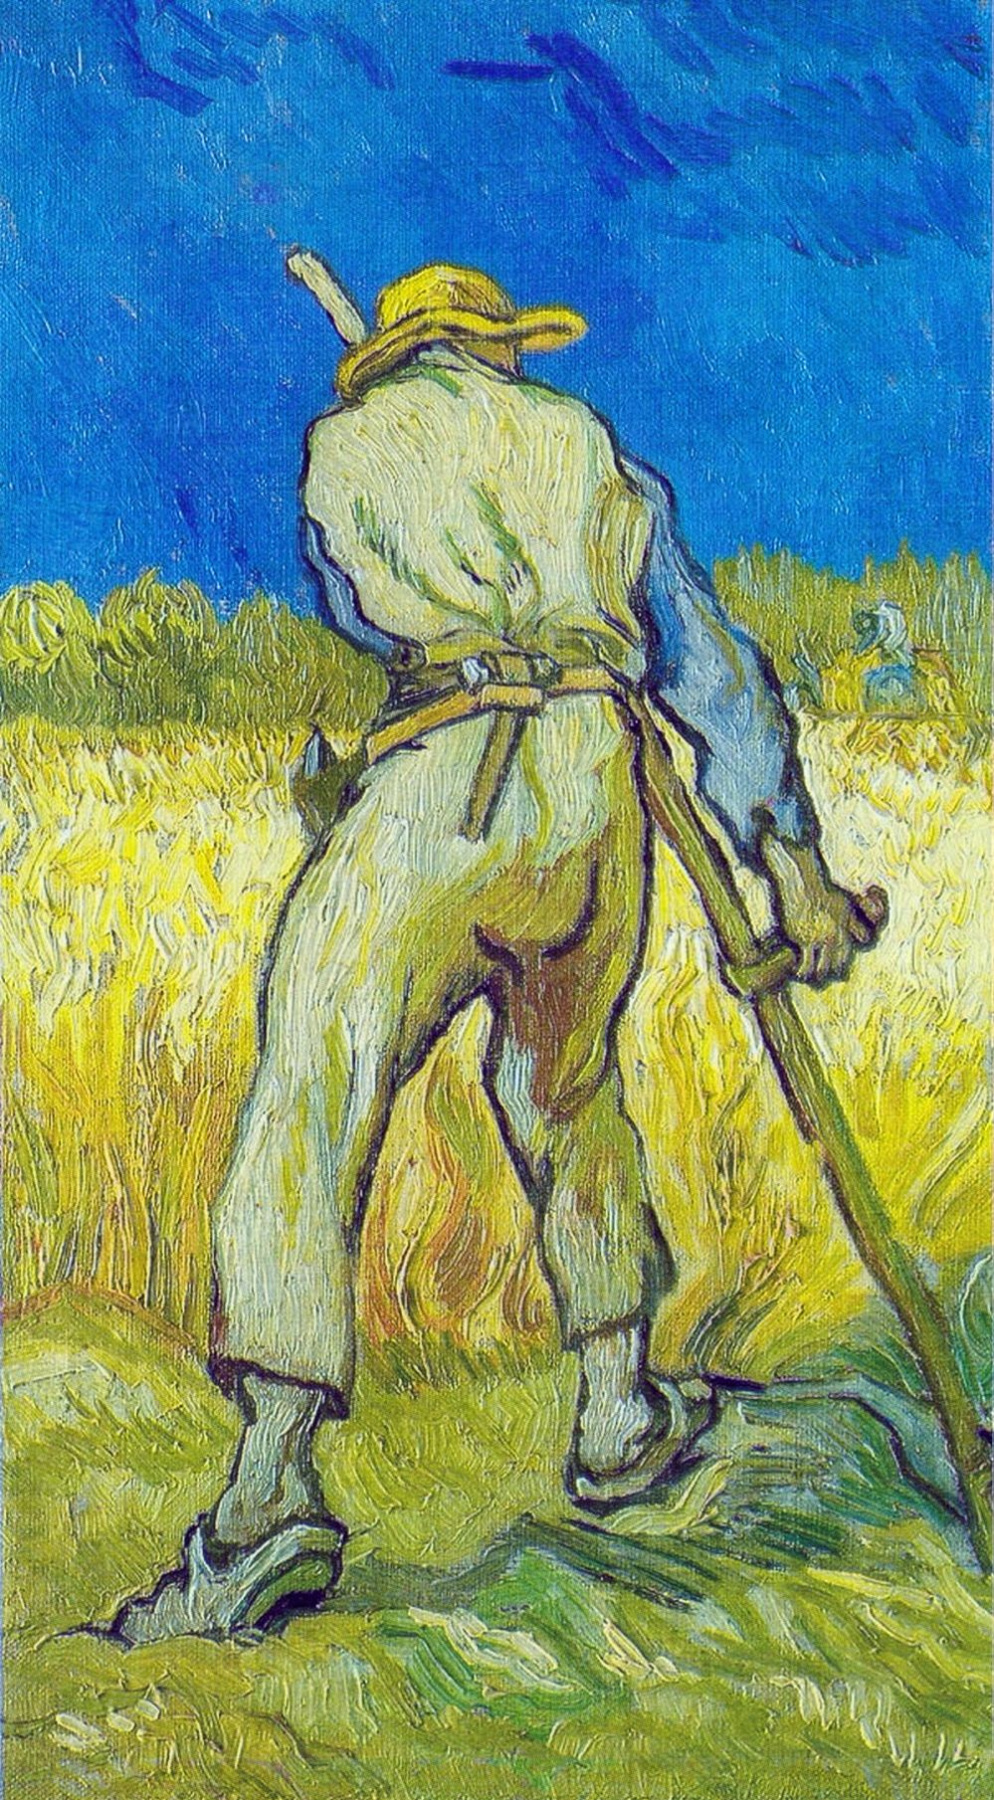 Винсент Ван Гог. Жнец (по мотивам Милле)